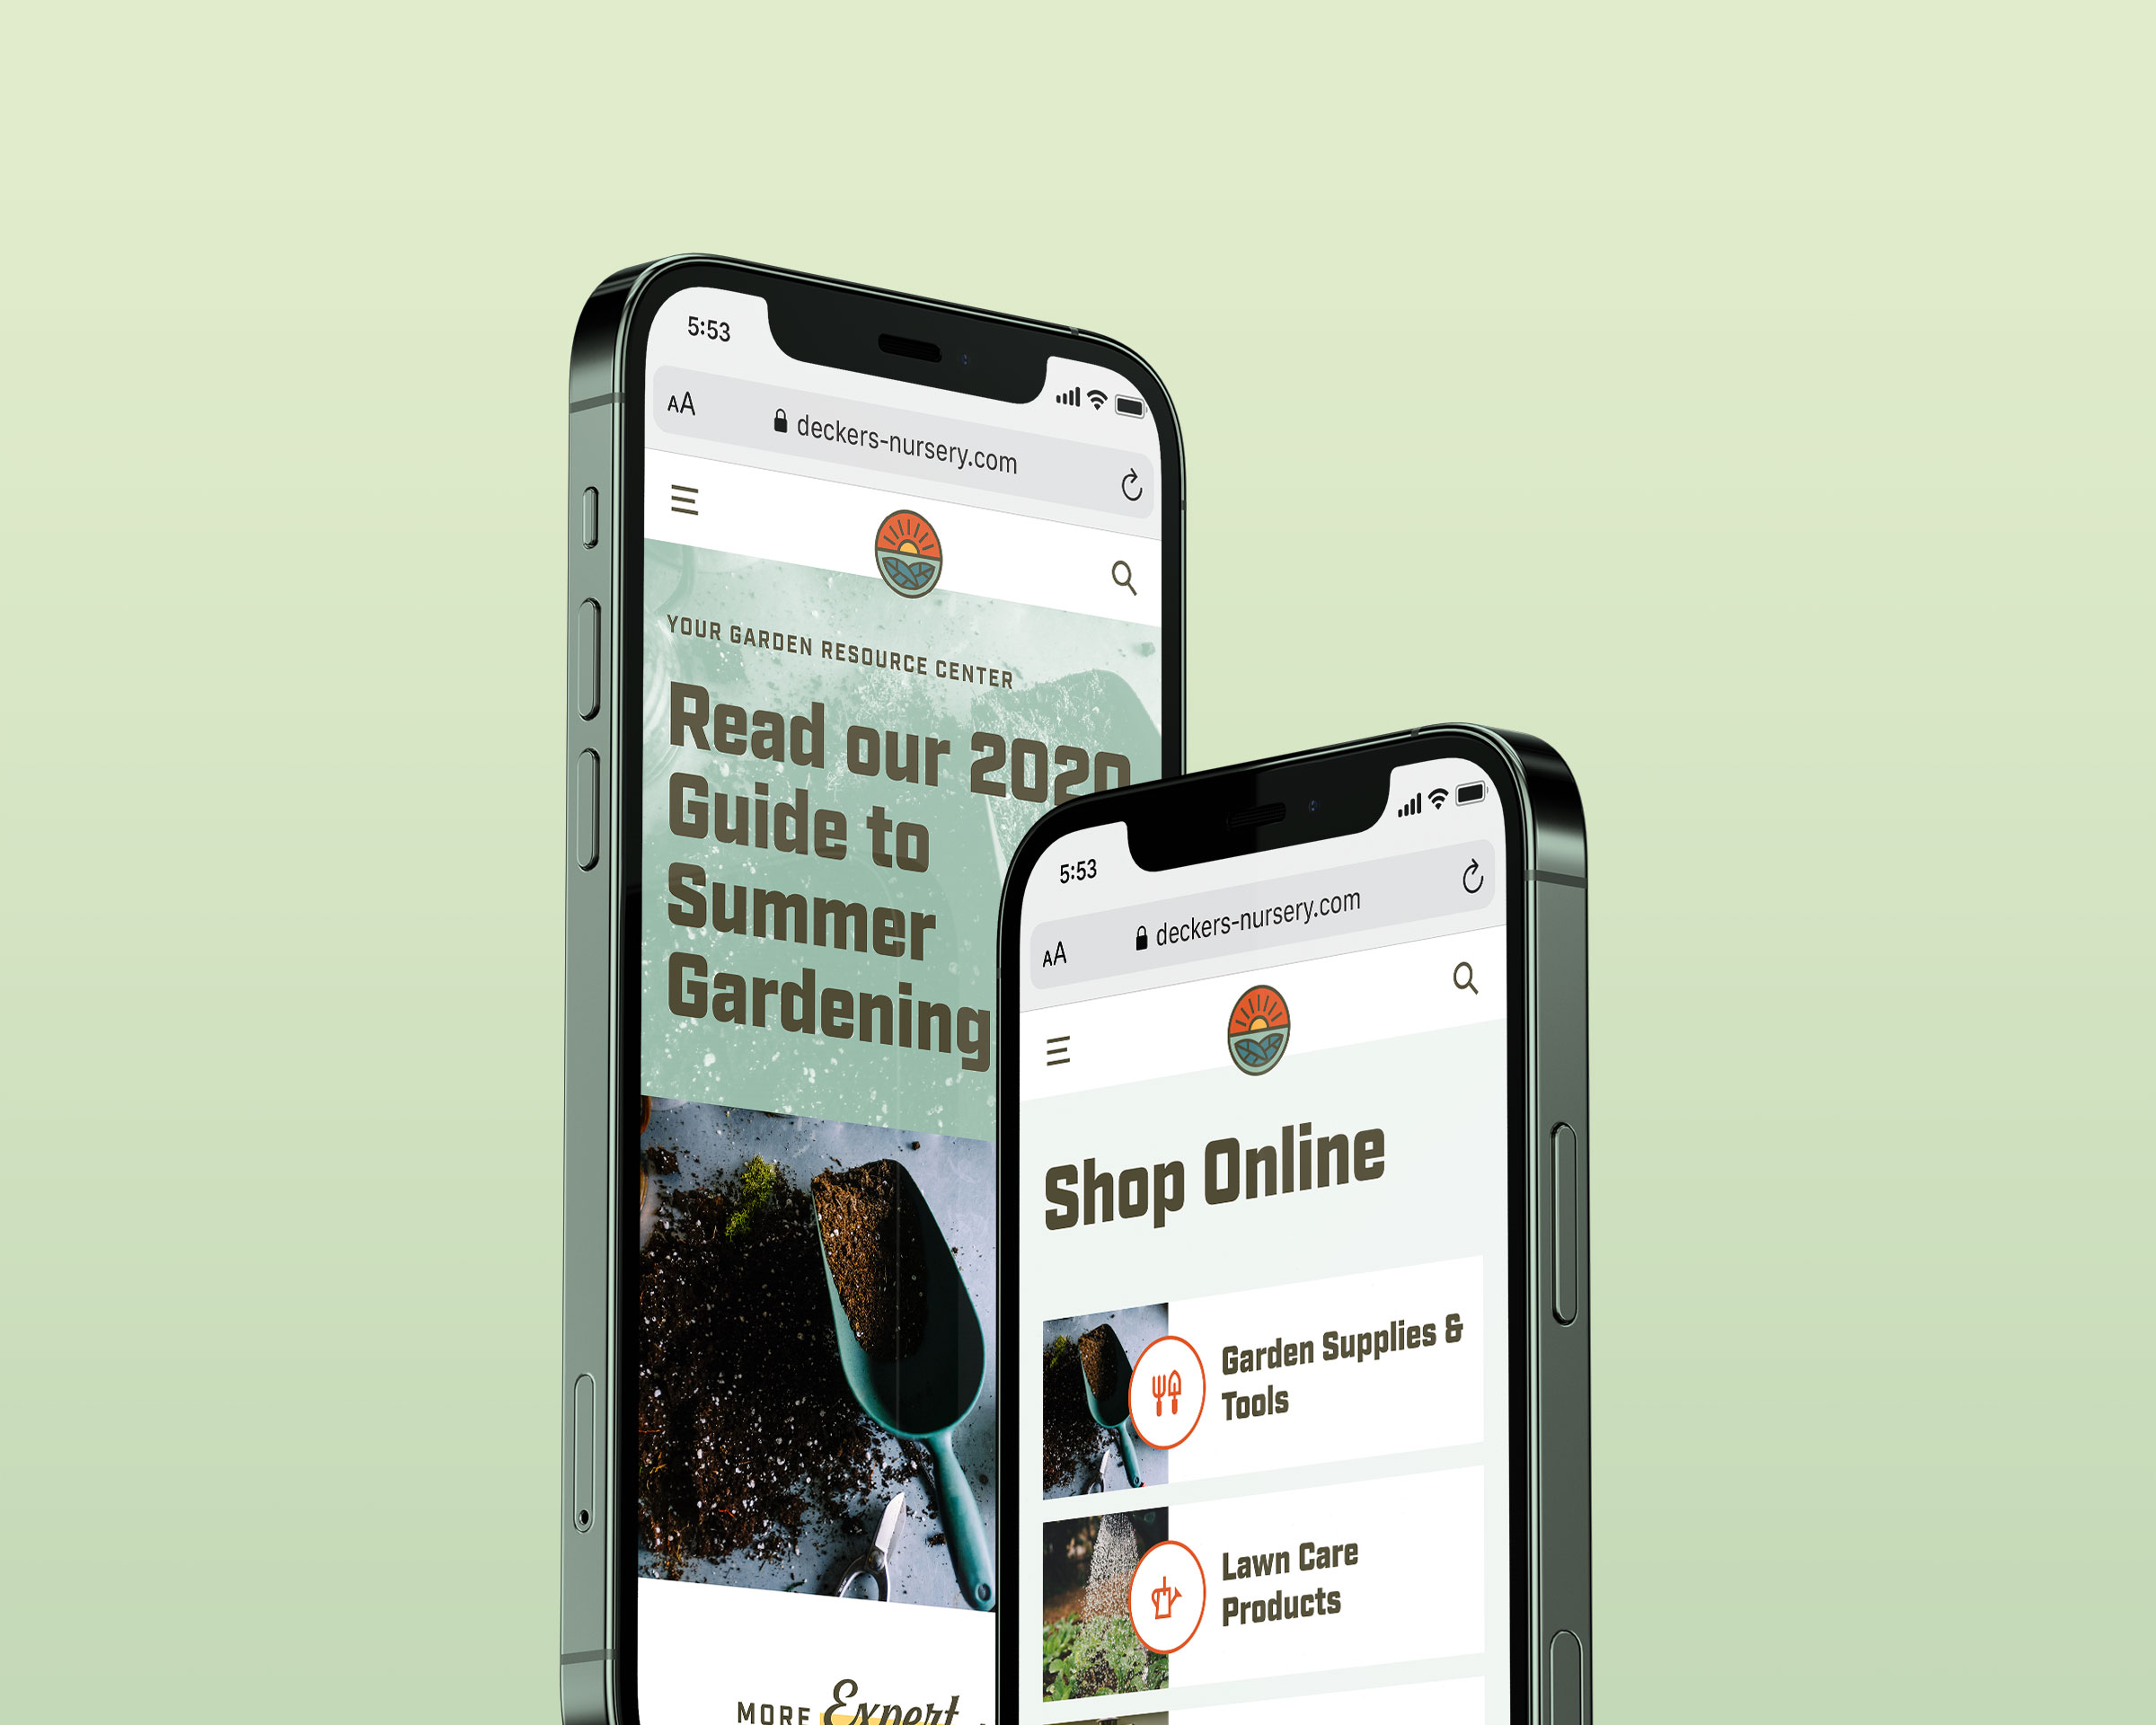 Mockup of Decker's Nursery website on an iPhone